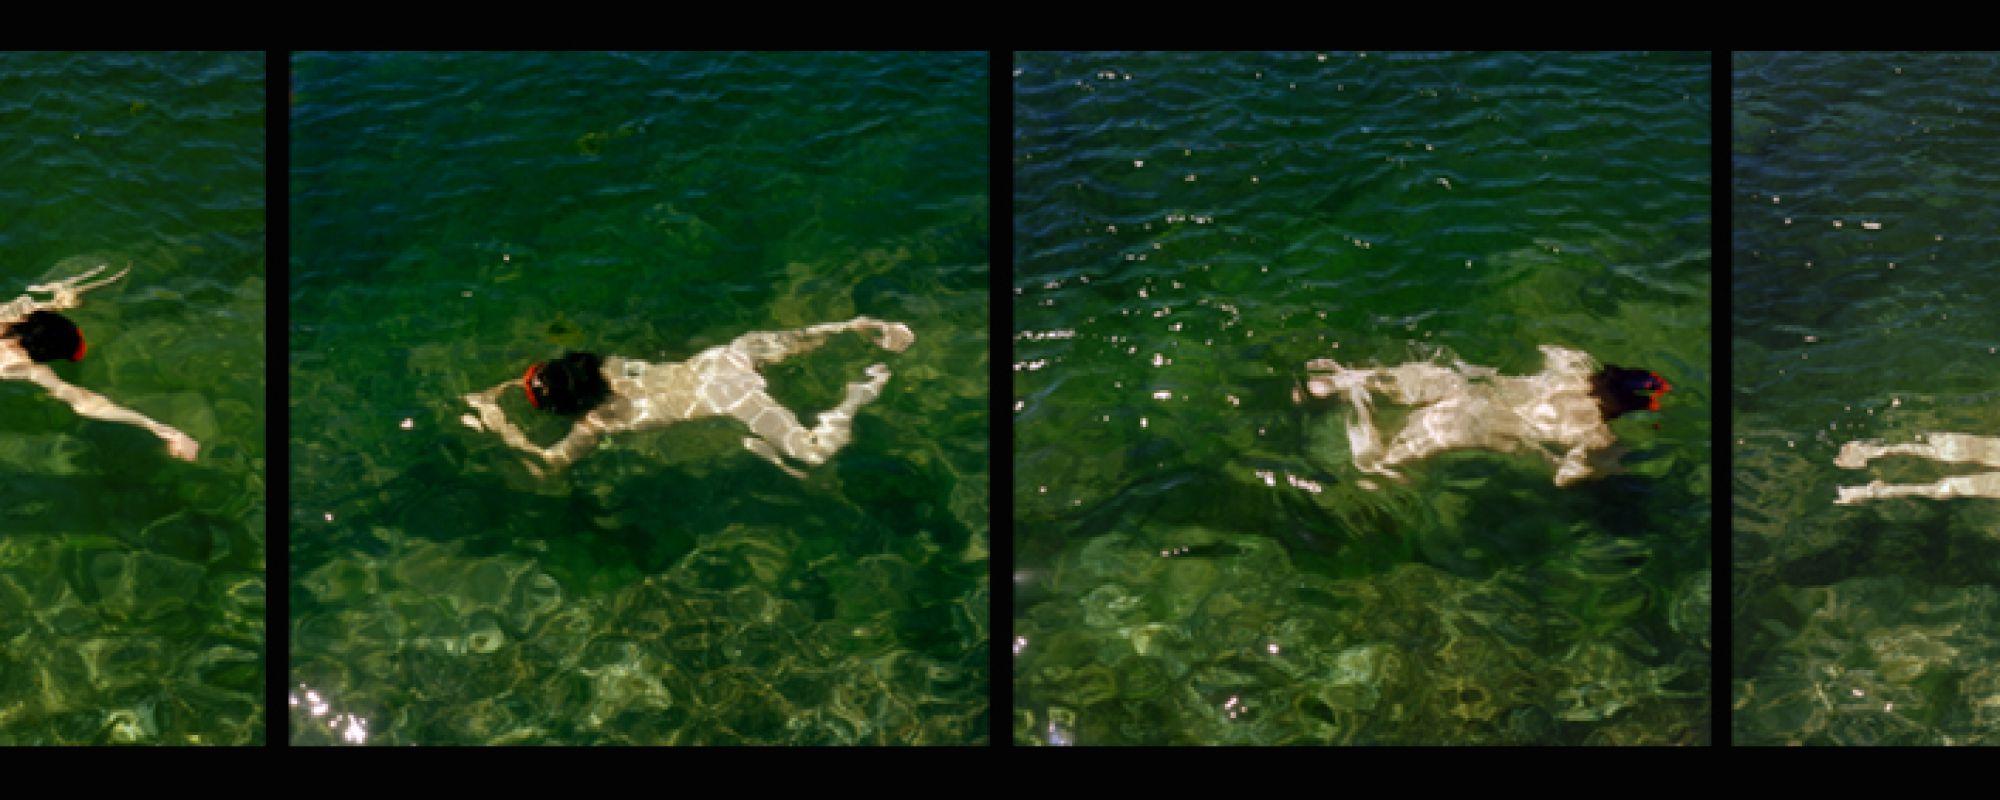 Mar Caldas